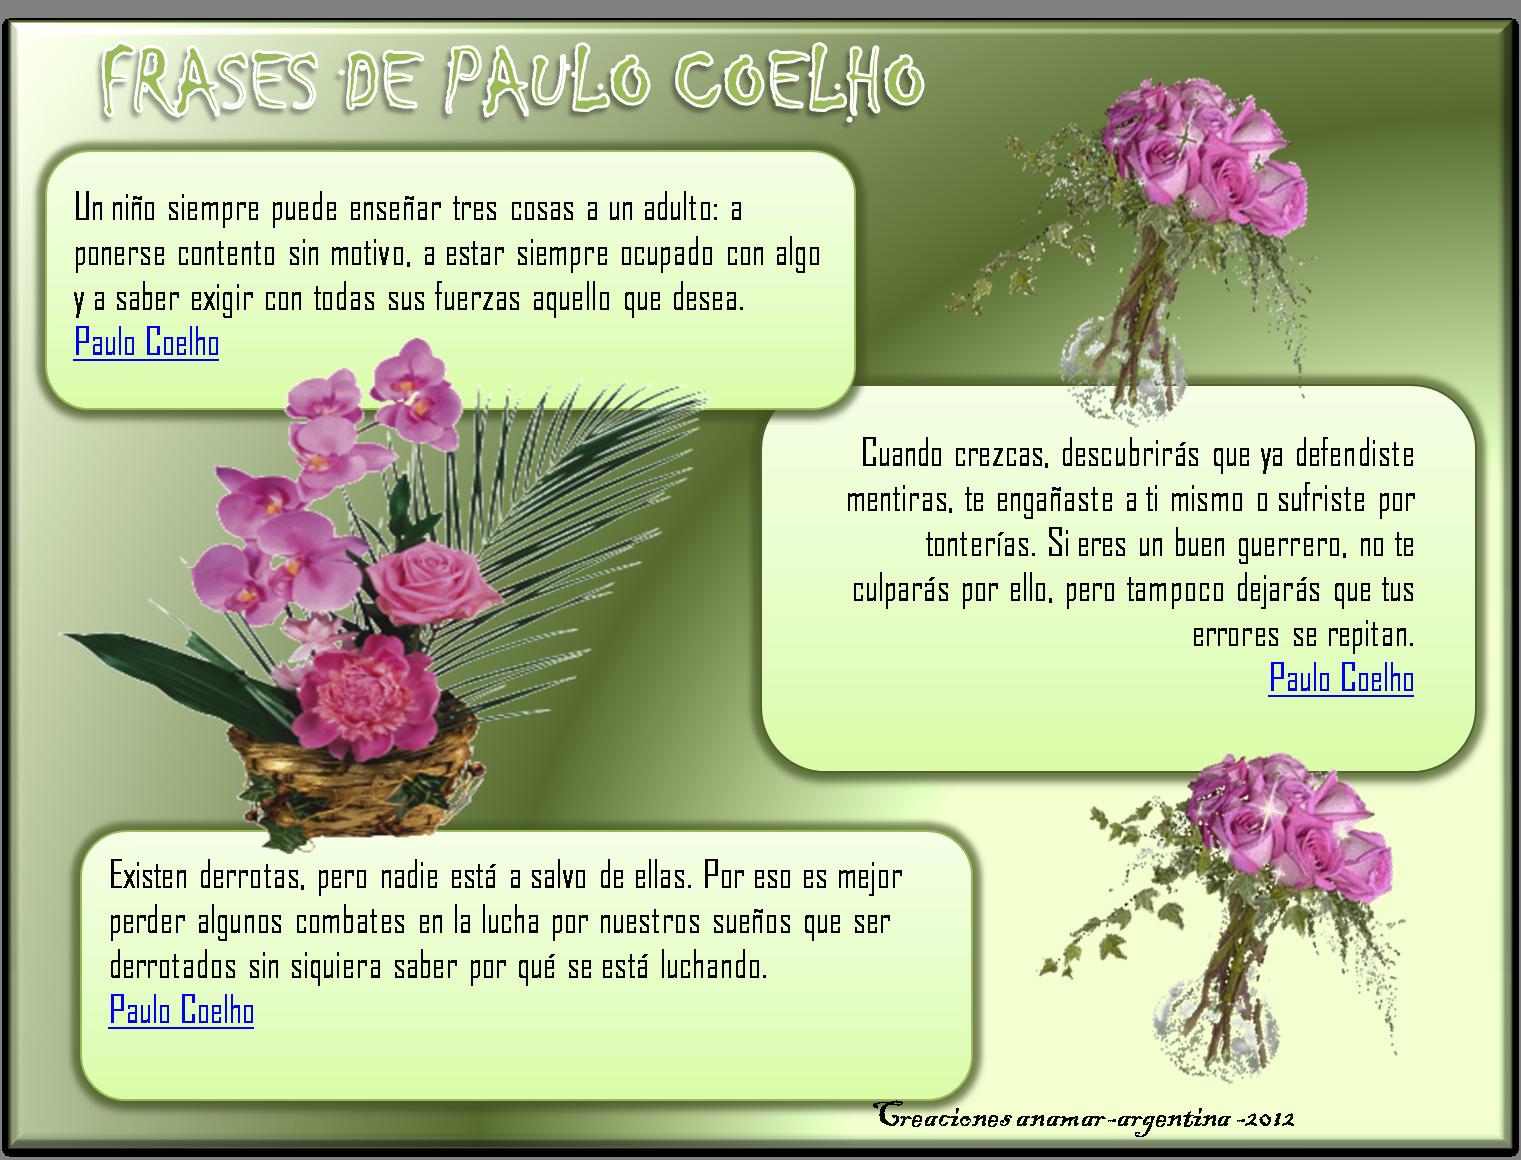 Frases de Paulo Coelho - Fotos Bonitas - Imagenes Bonitas